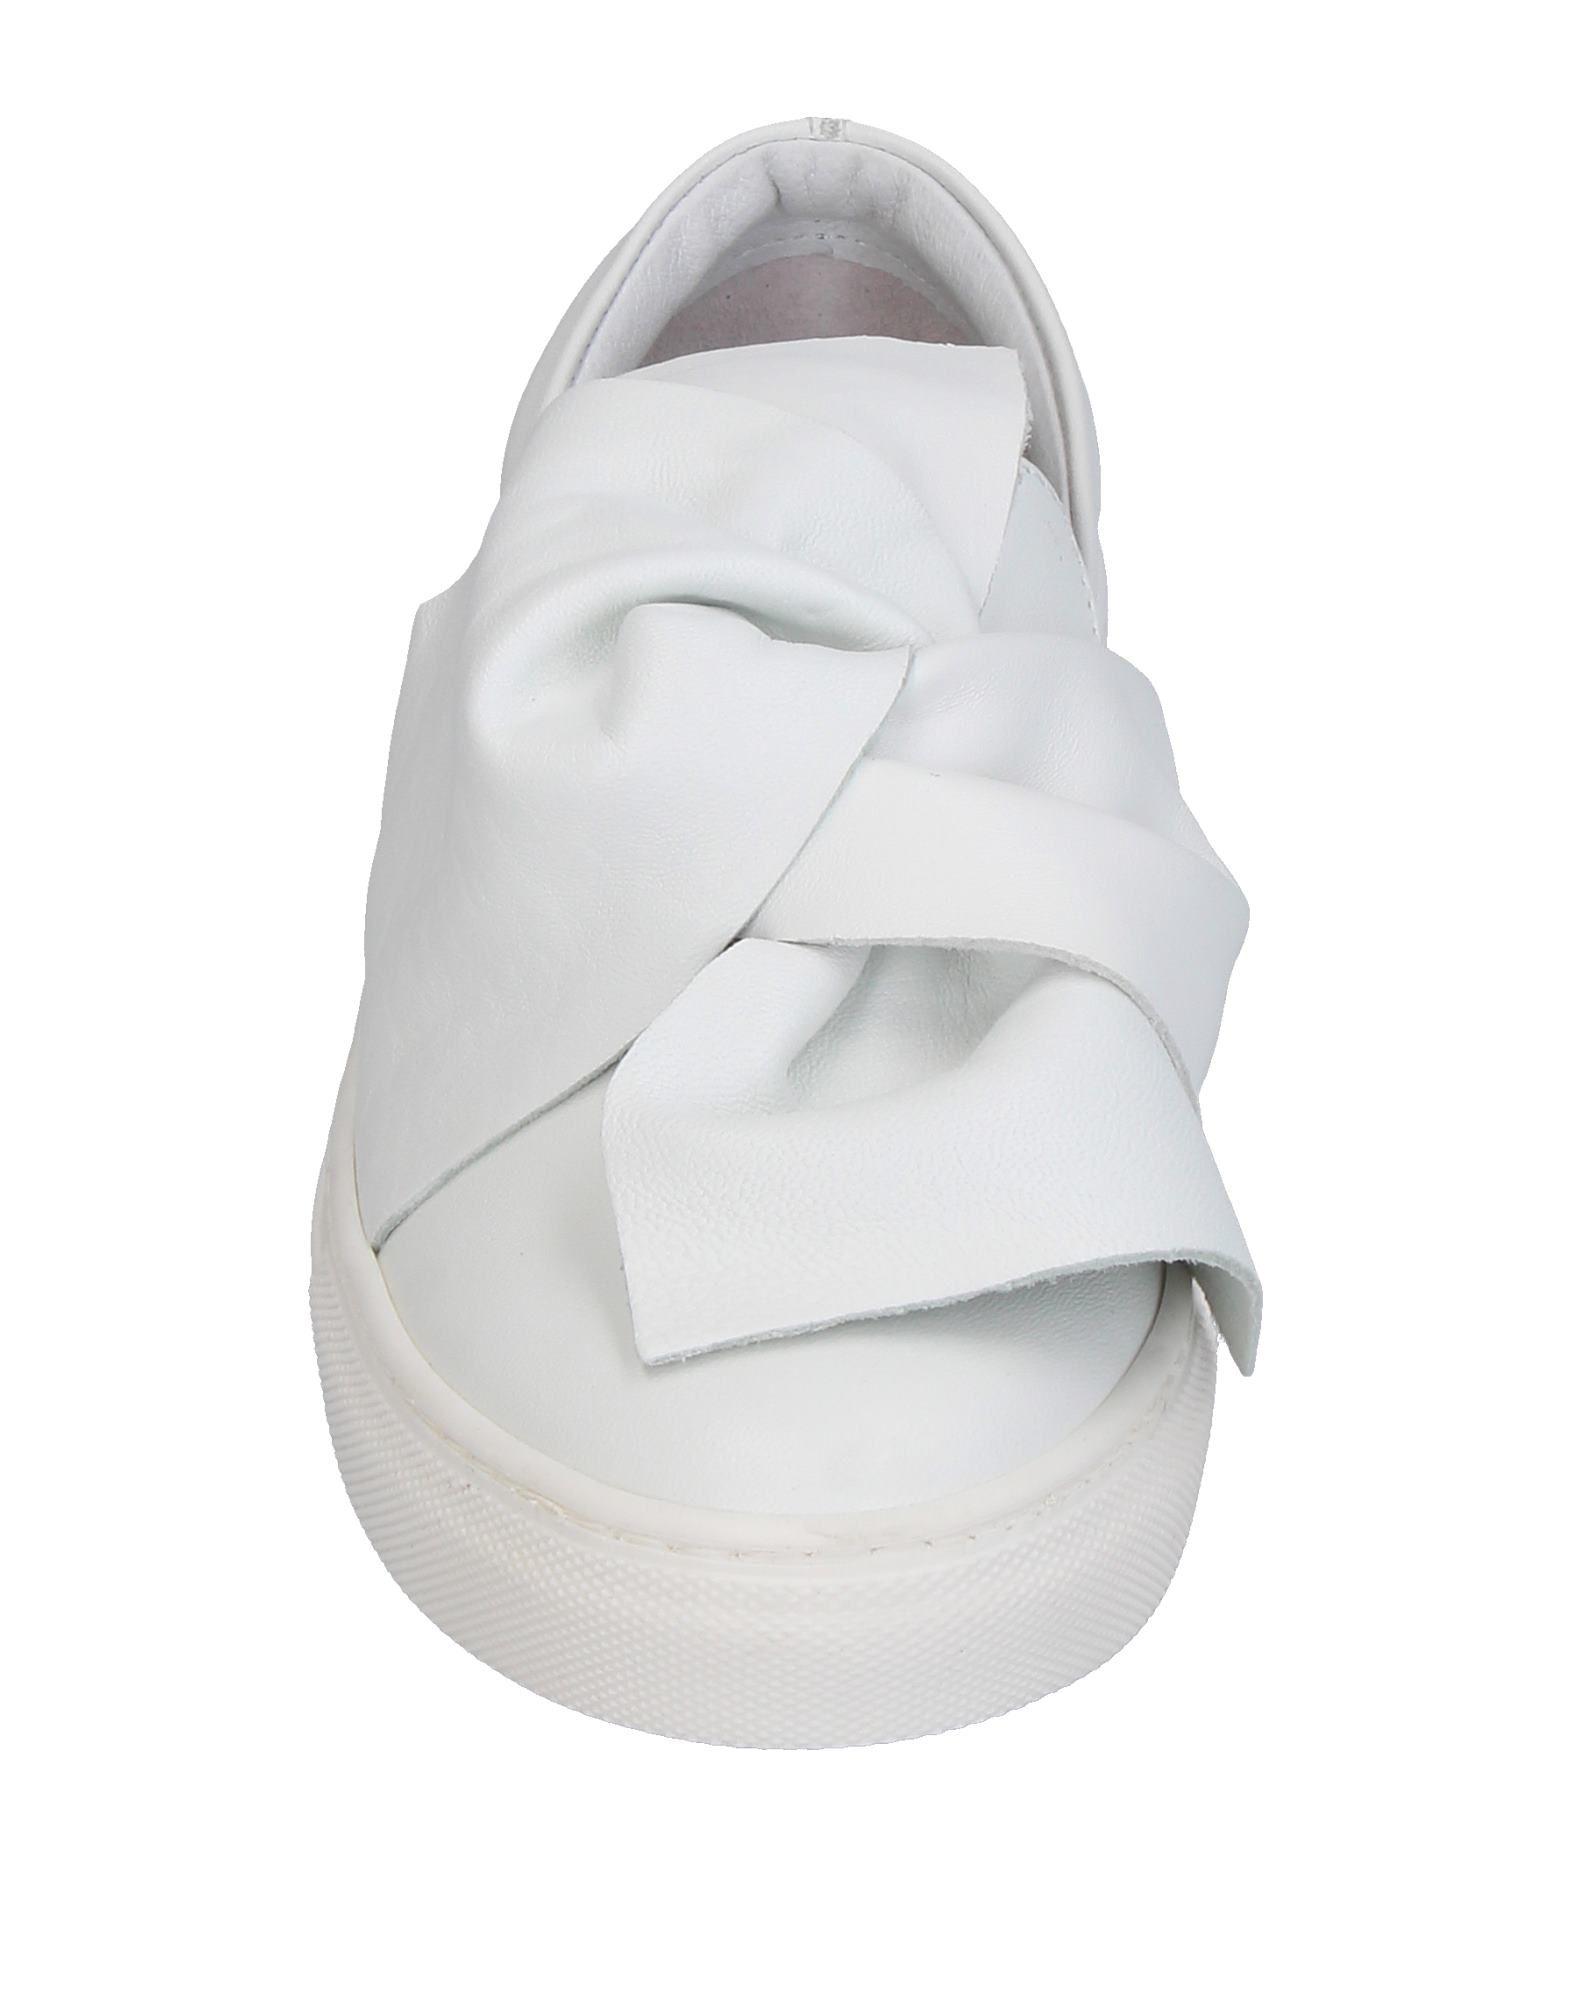 Sneakers Brawns Femme - Sneakers Brawns sur